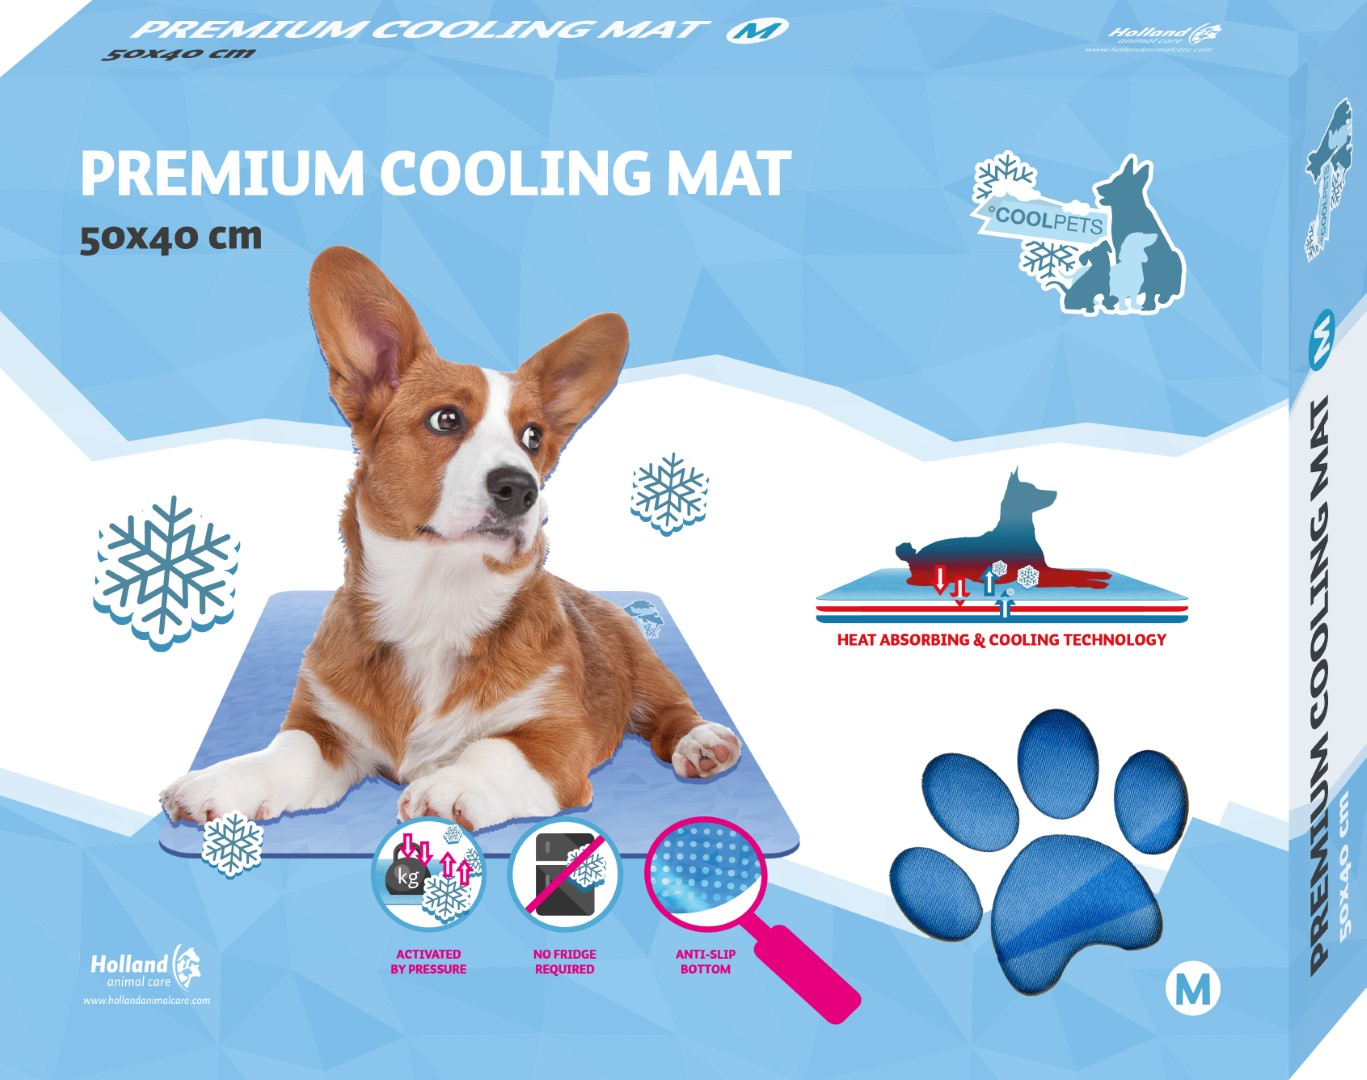 CoolPets Premium Cooling Mat M (50x40cm)